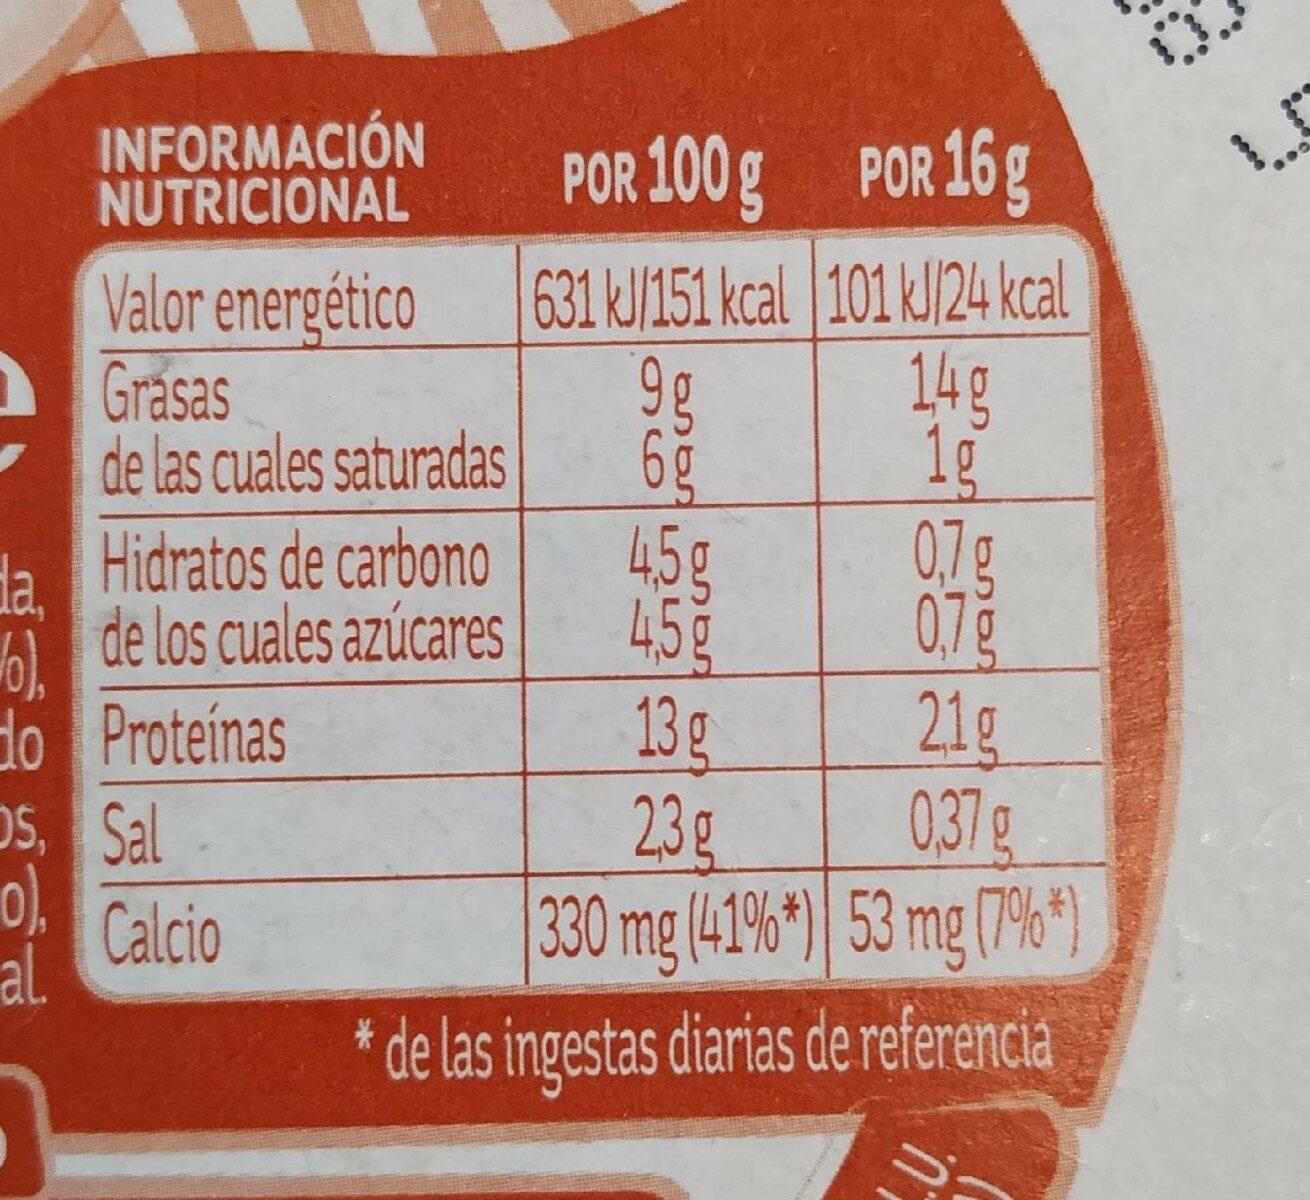 Quesitos light con emmental - Información nutricional